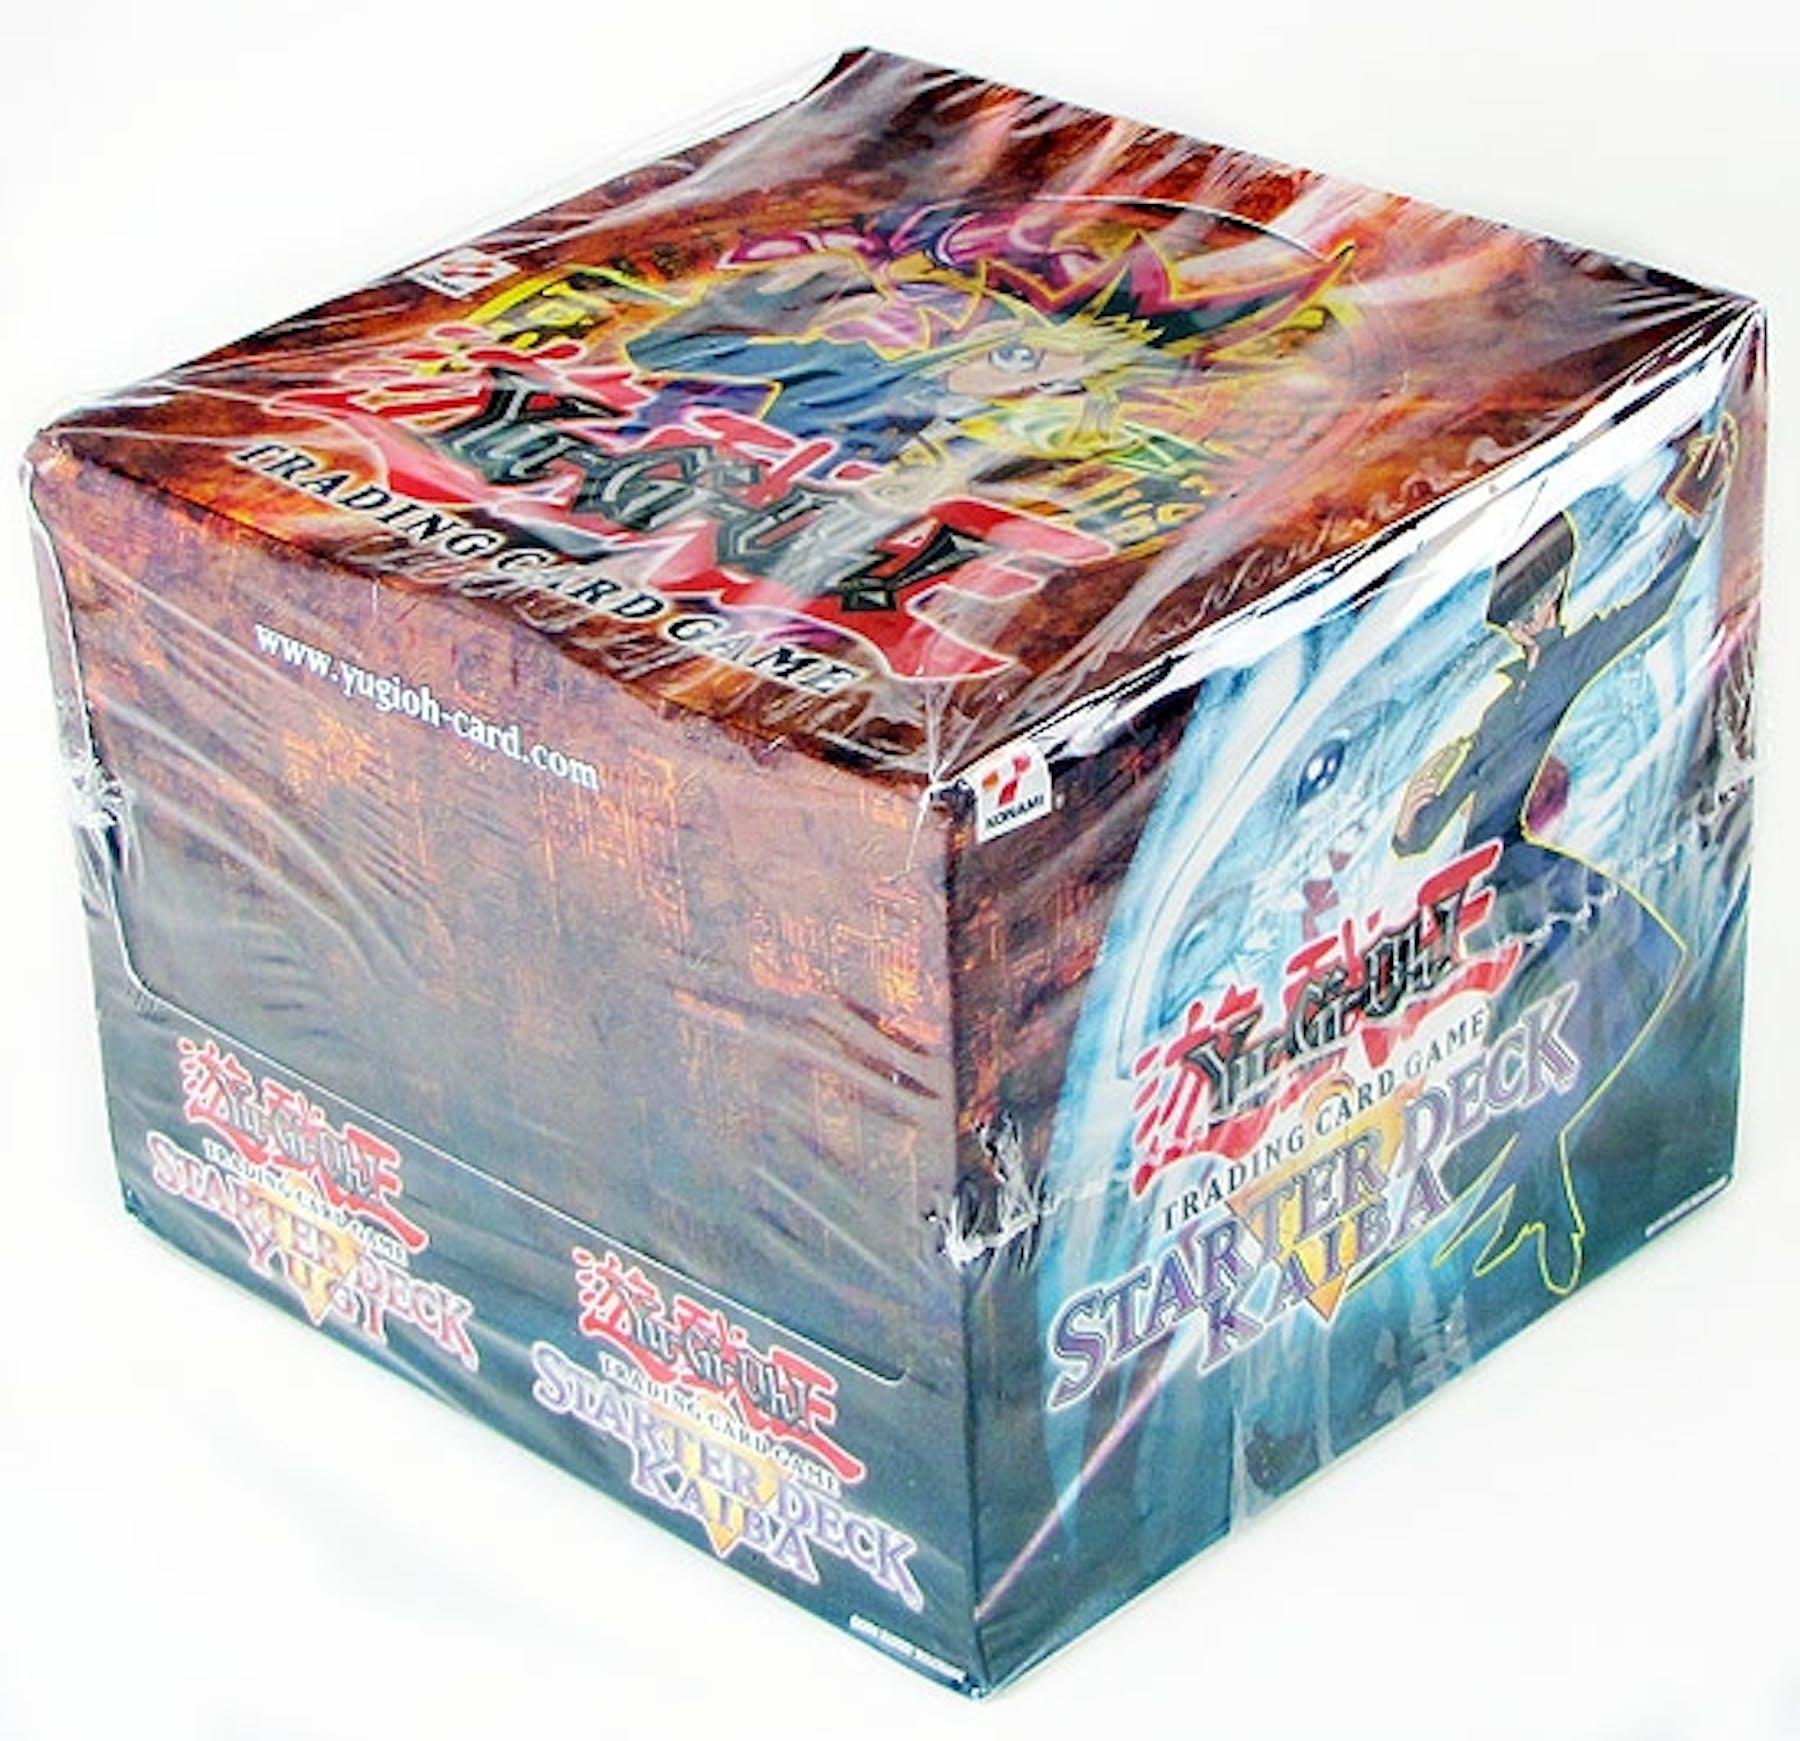 Yu-Gi-Oh Yugi/Kaiba 1st Edition Starter Deck Box